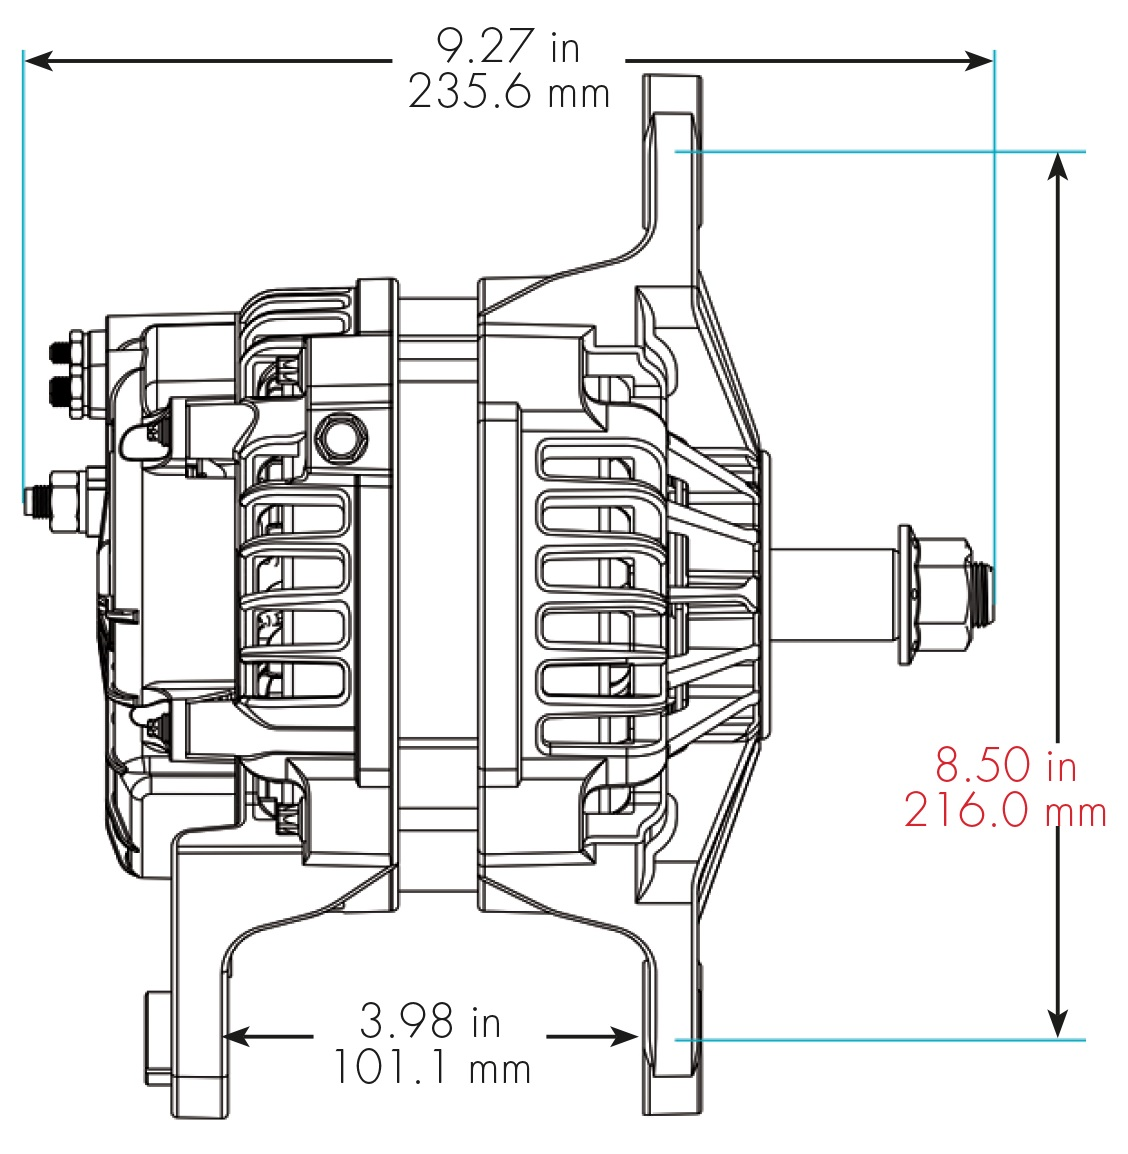 Saturn Delco 21023480 Radio Wiring Diagram Model 15071234